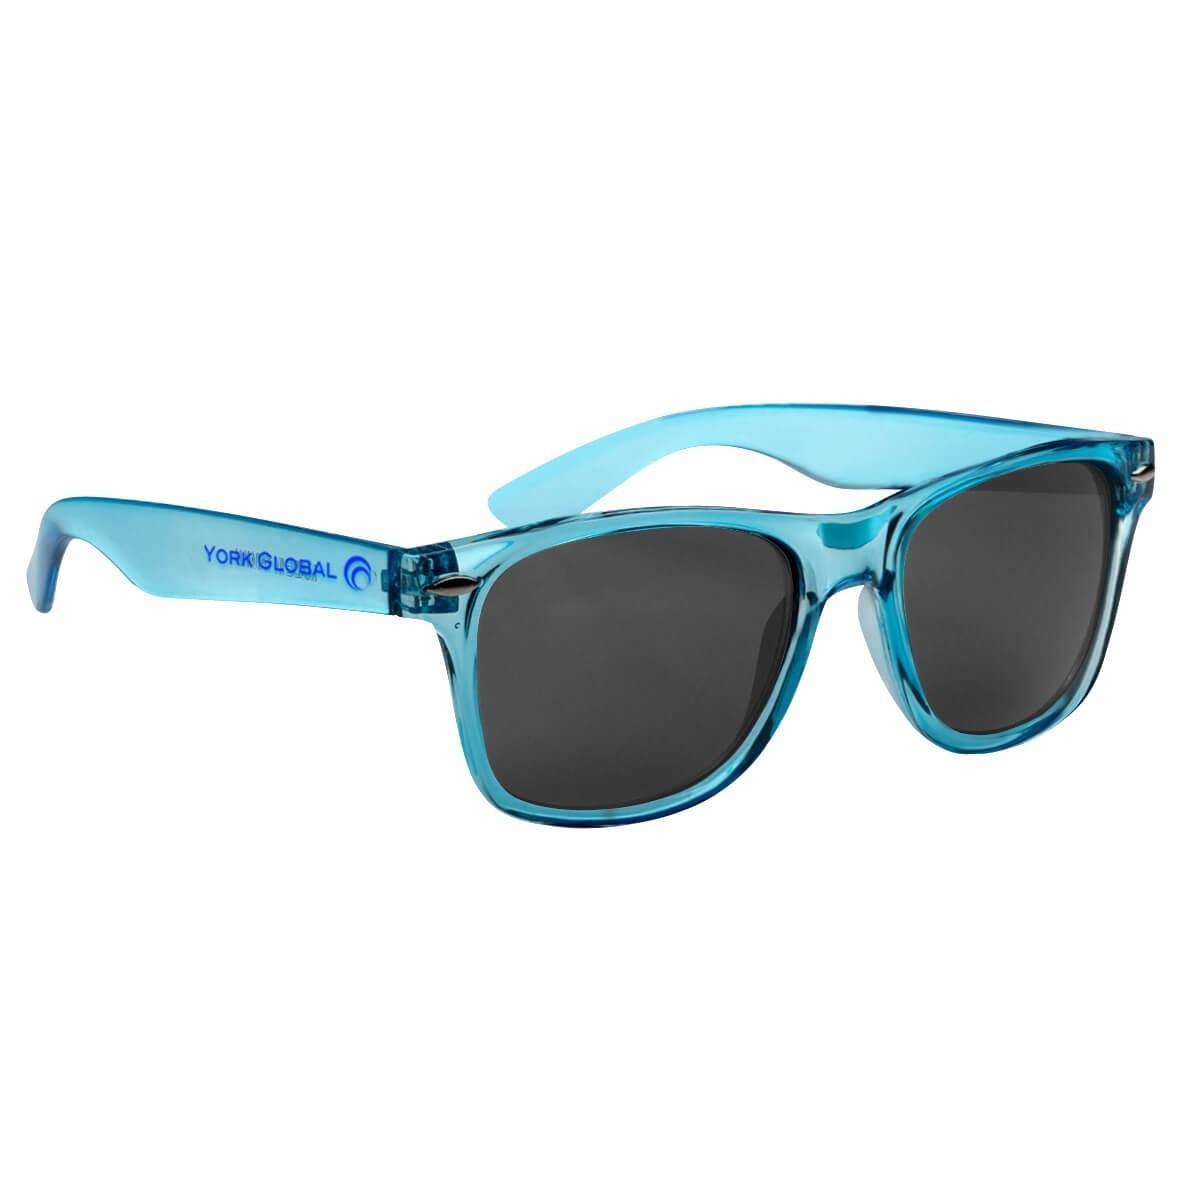 Promotional Translucent Sunglasses